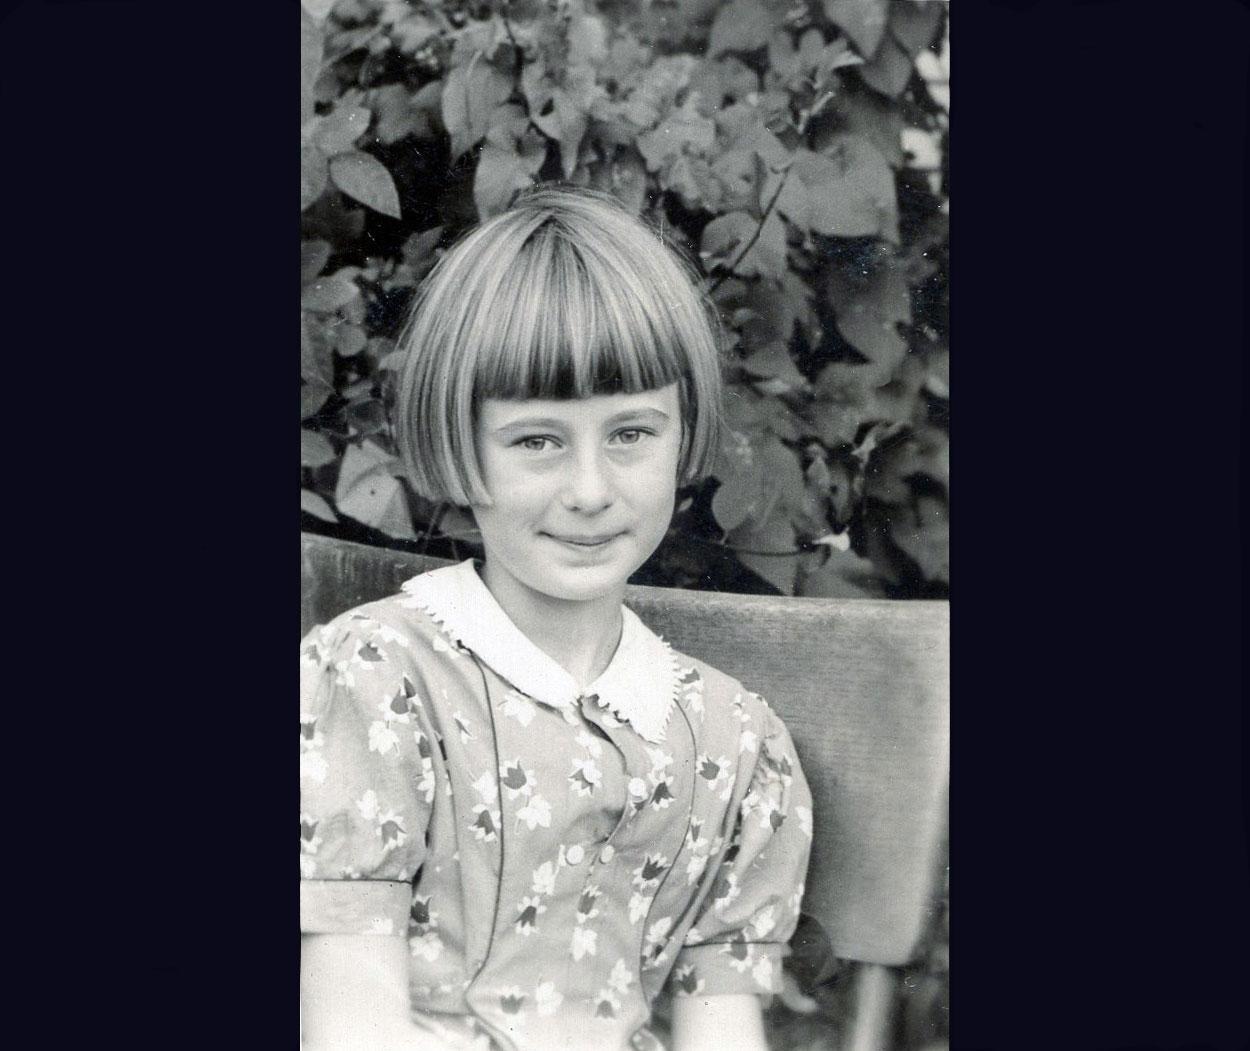 Margaret Marie McKay